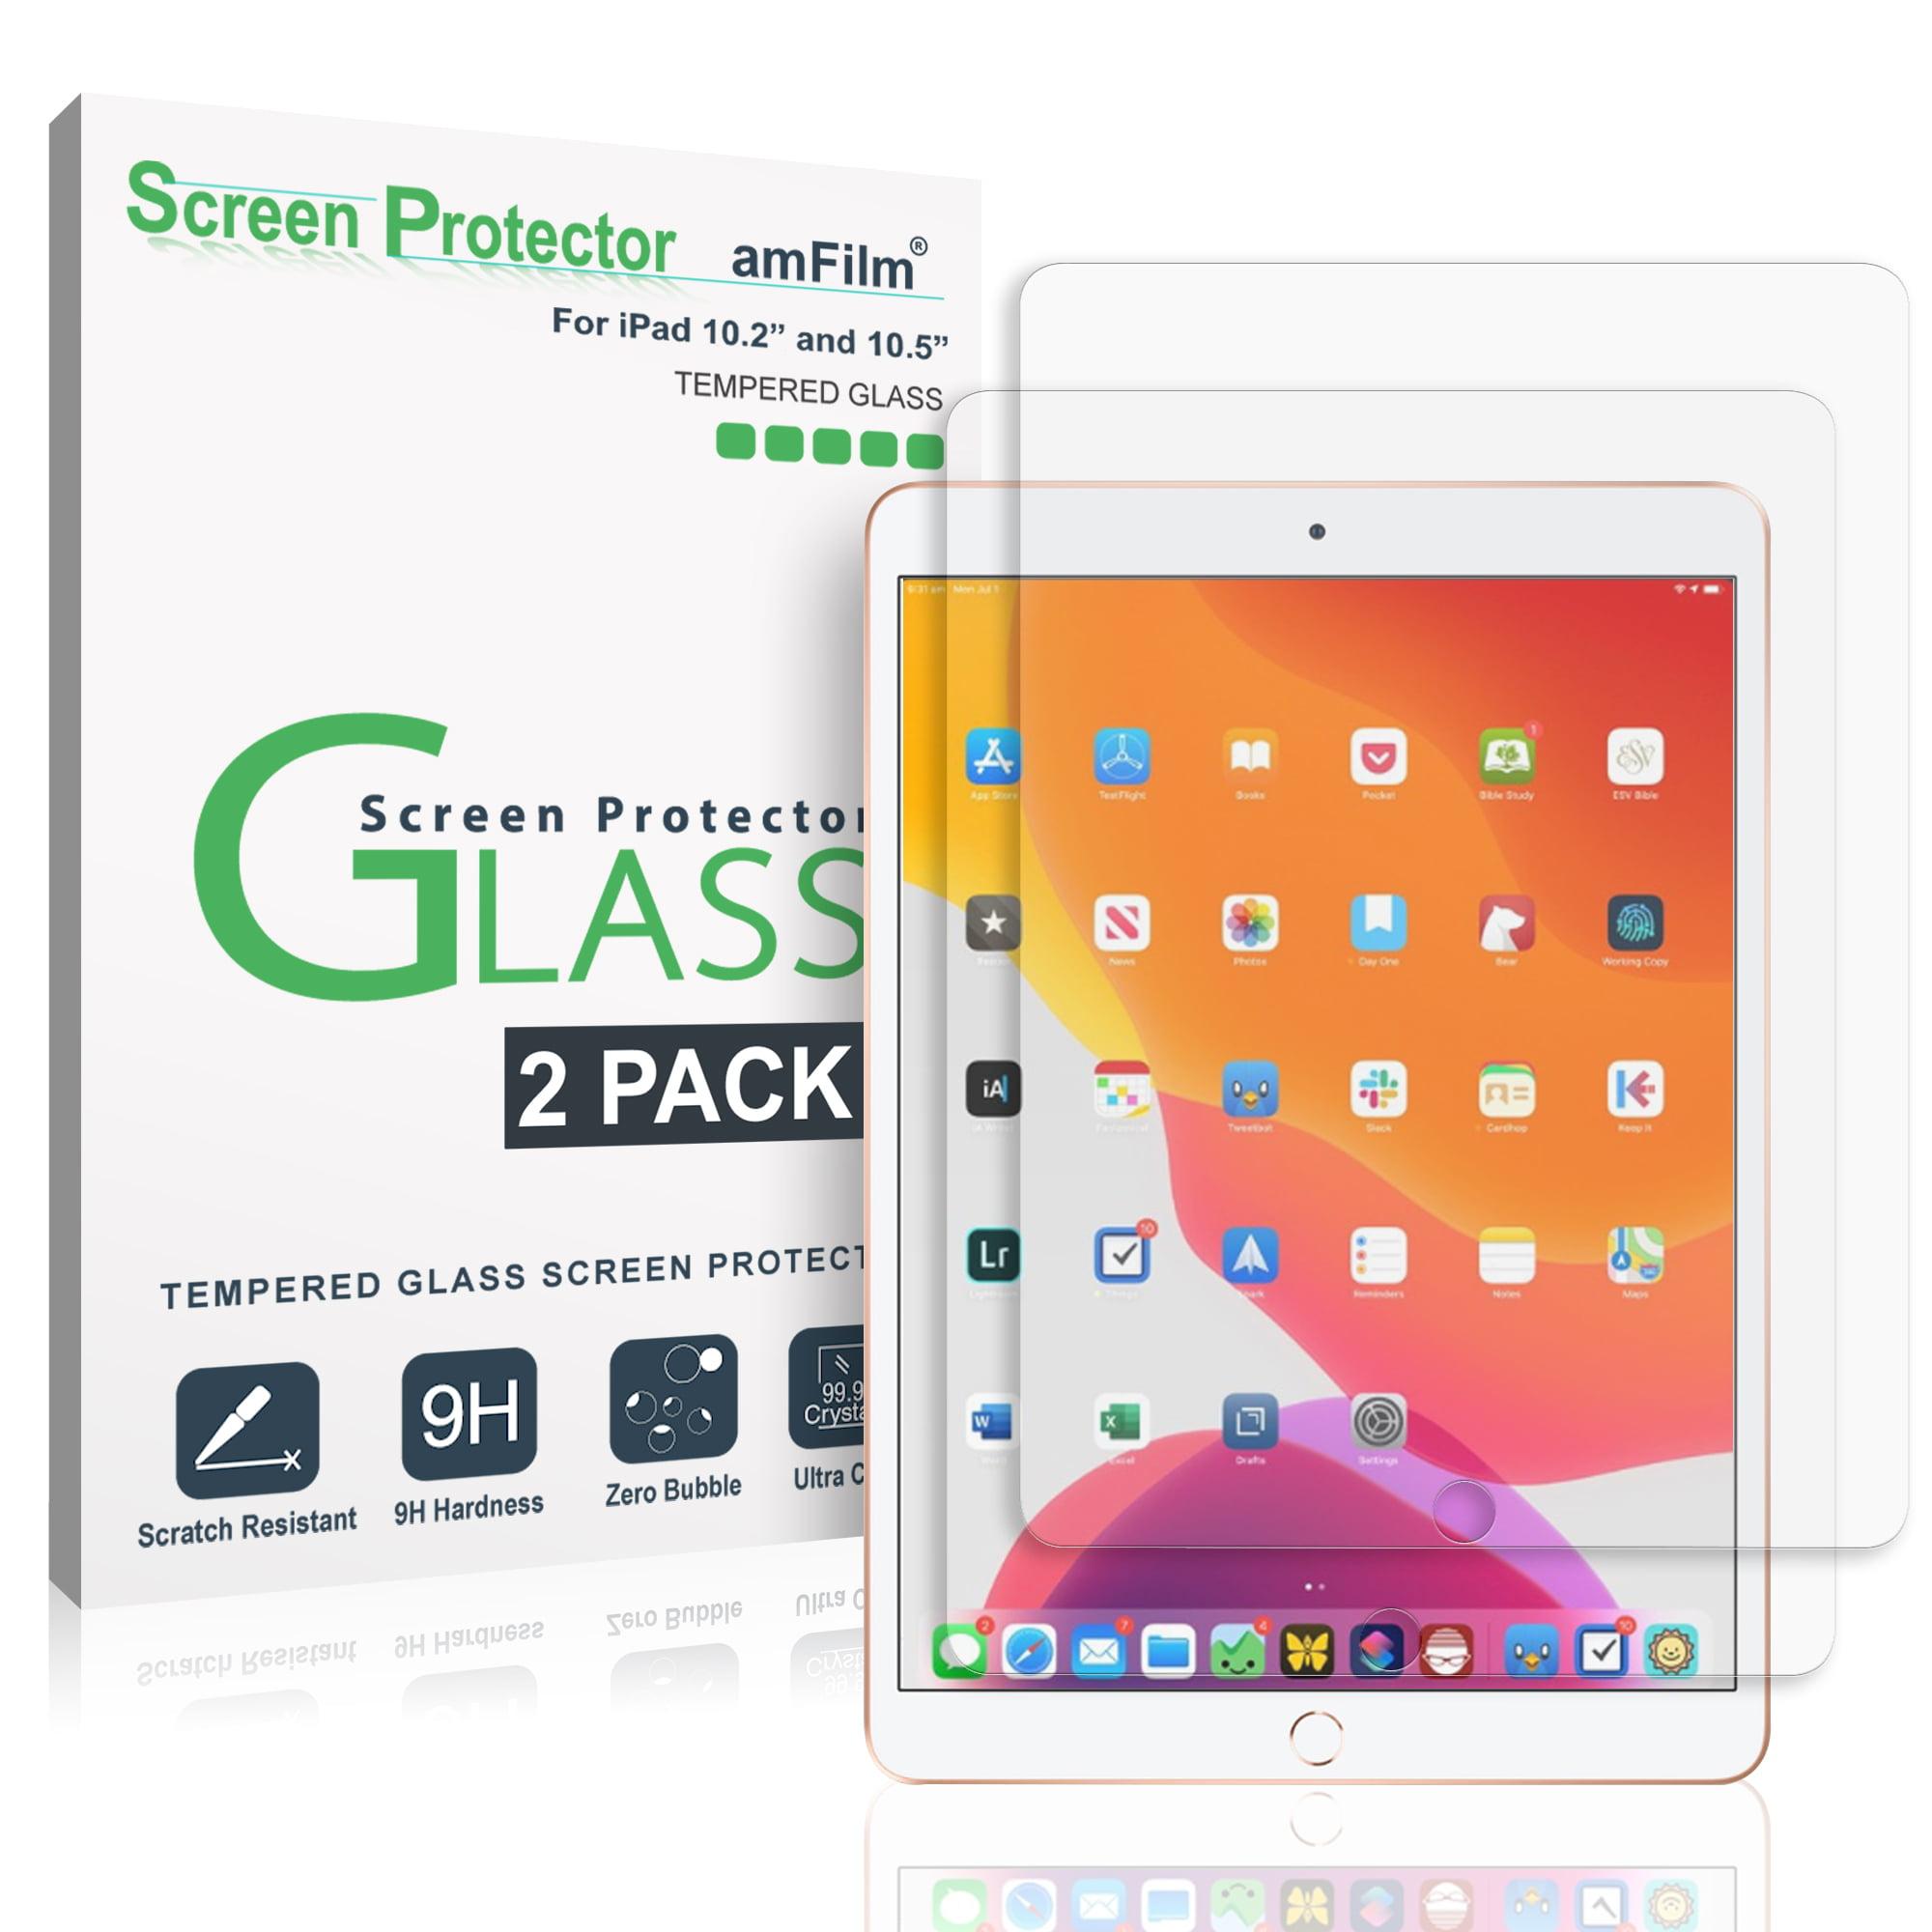 9H, 2-PACK Tempered Glass - SuperGuardZ iPad Pro 10.5 2017 Screen Protector